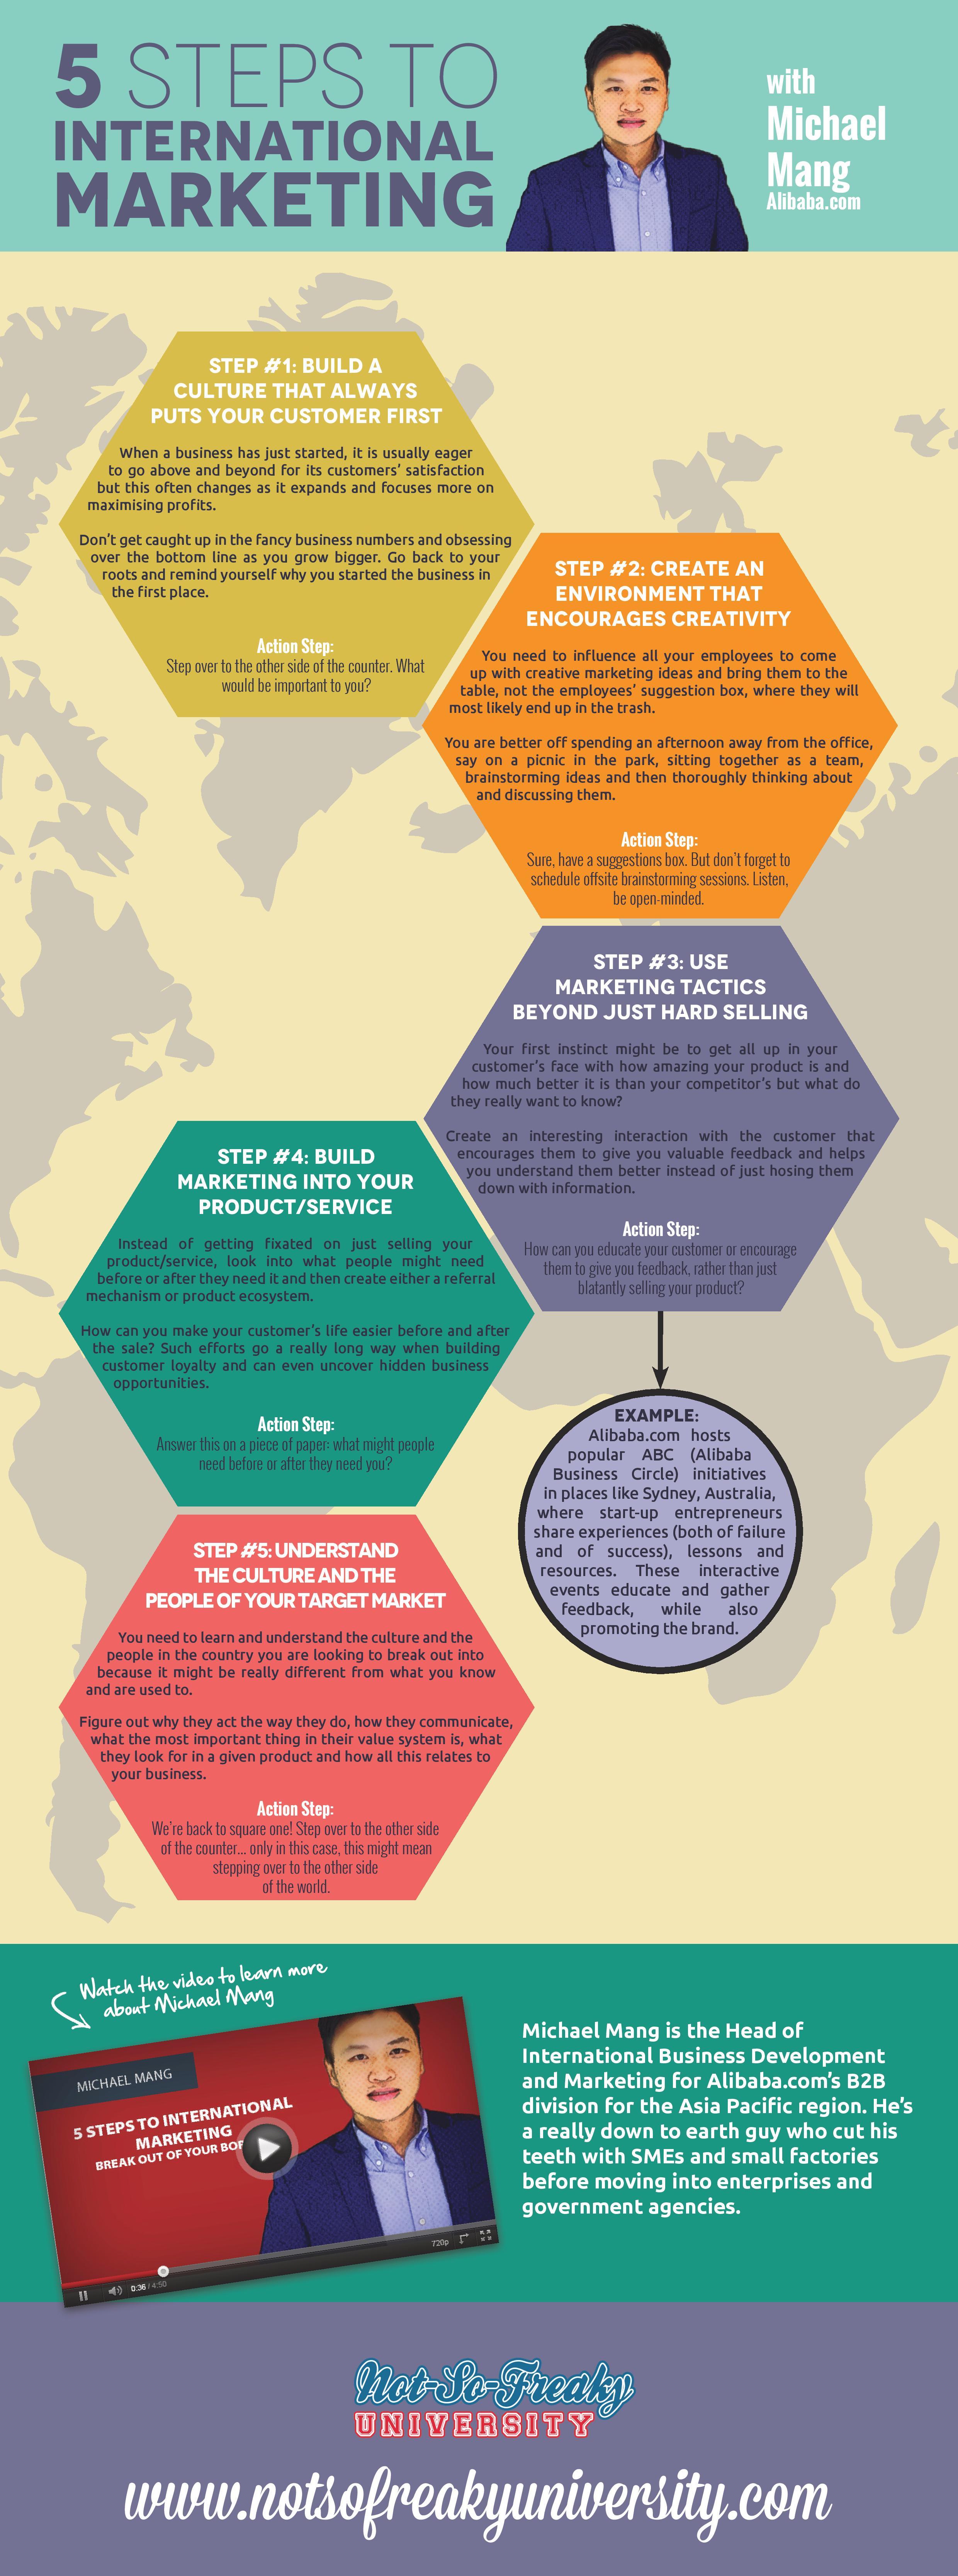 james - Michael Mang - infographic NSFU 01-page-001